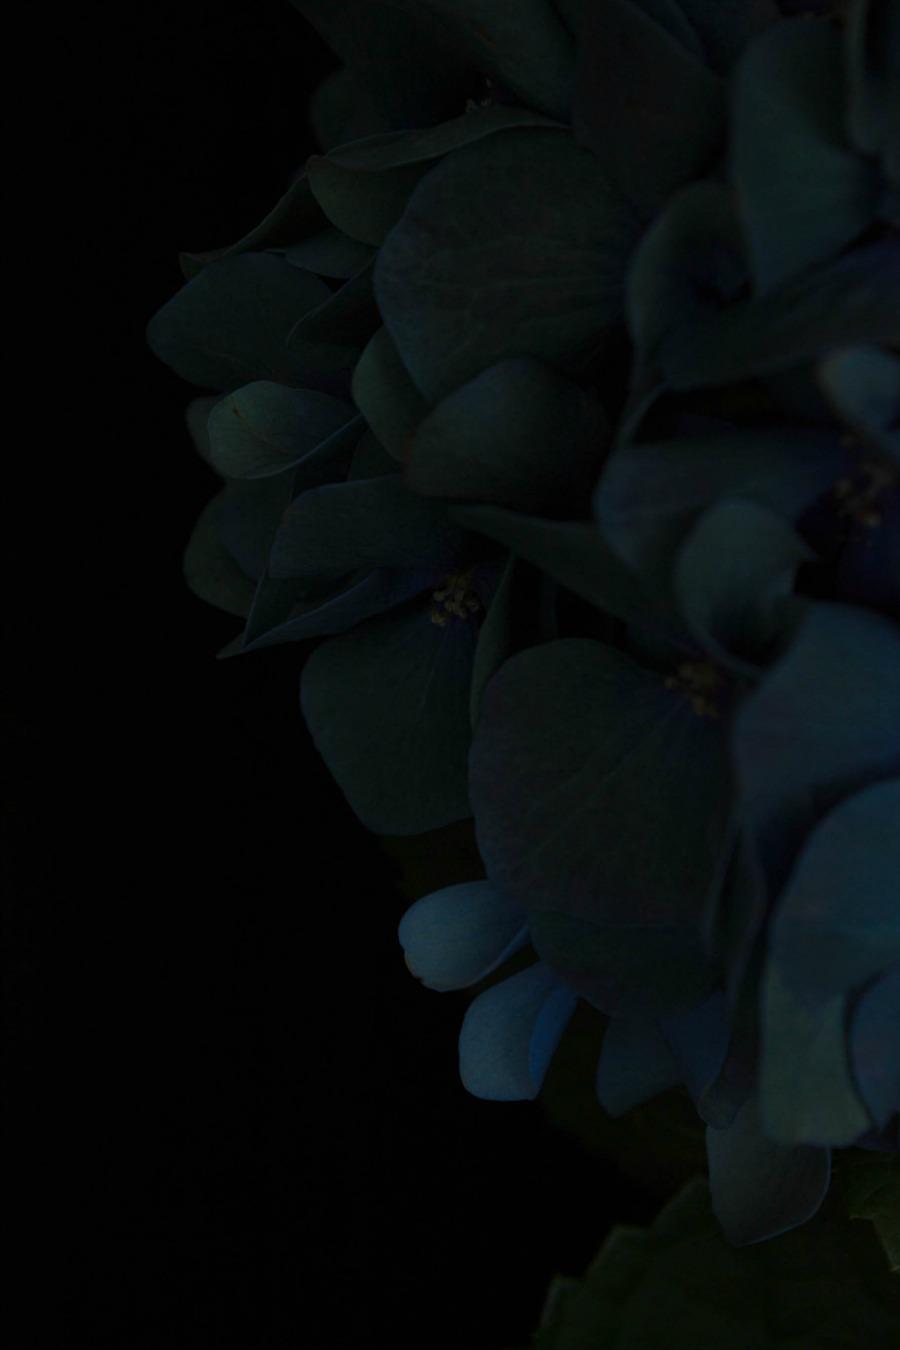 hortensia_2_small.jpg